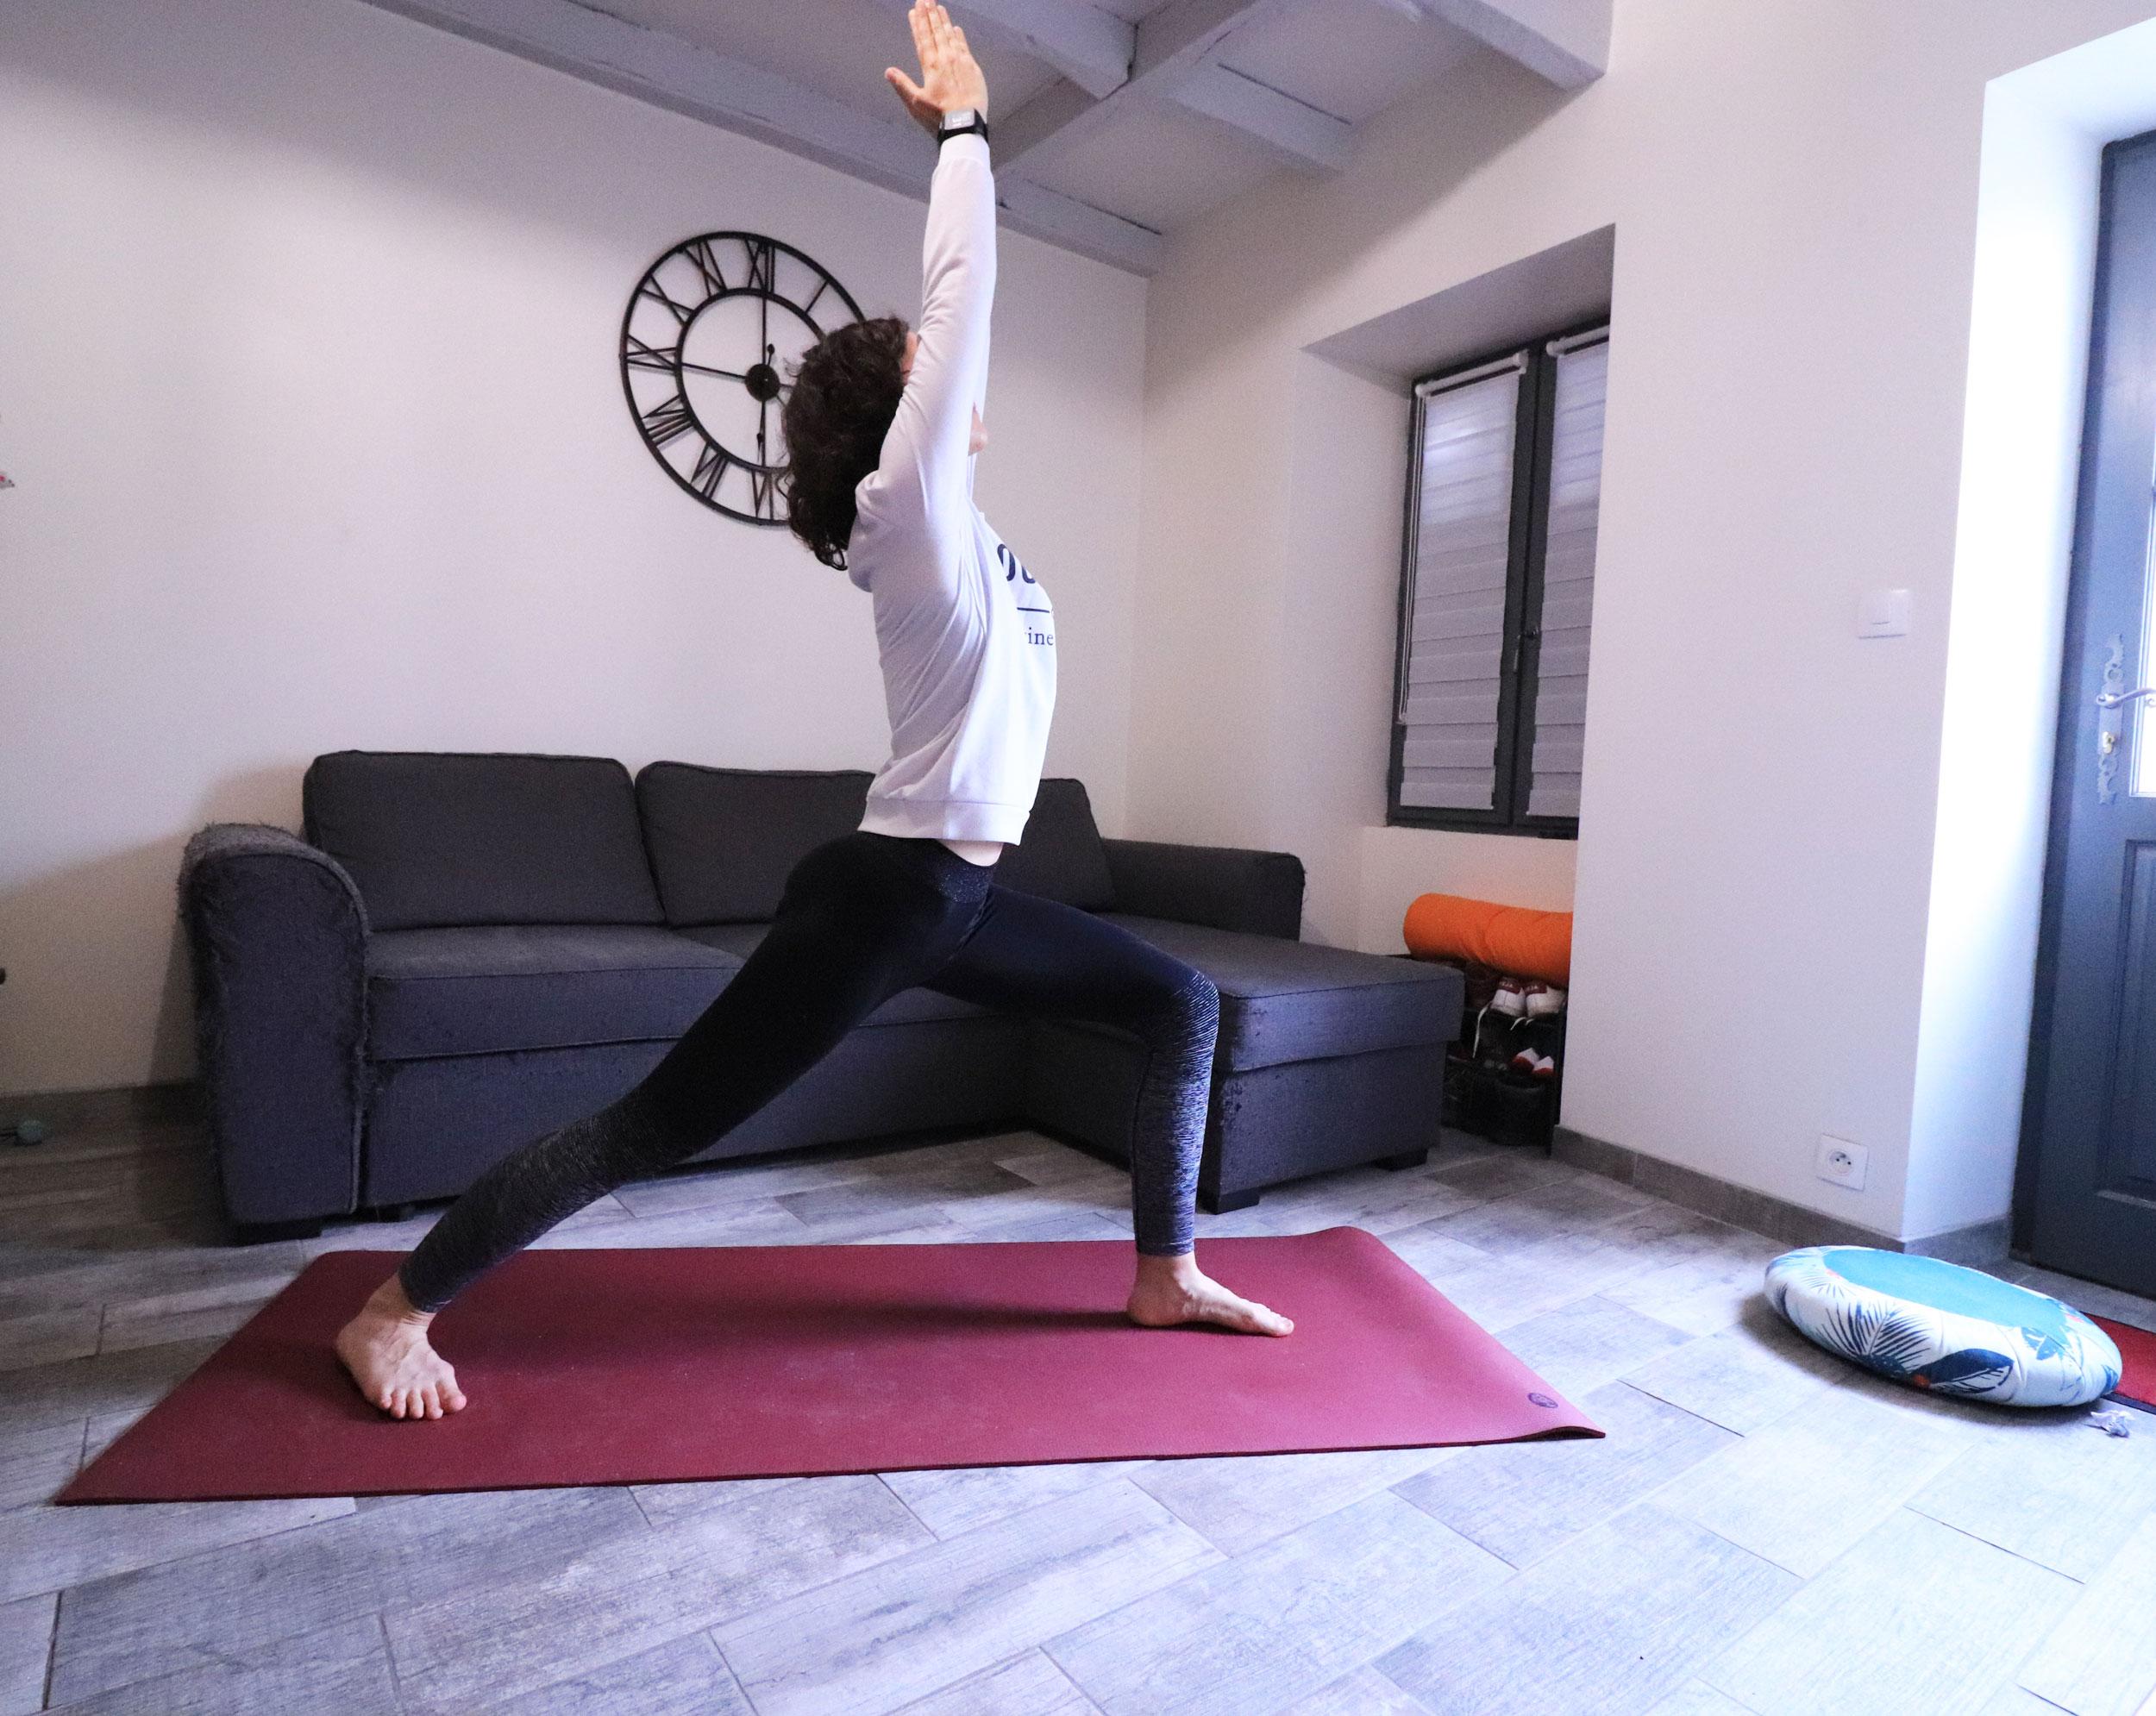 posture du guerrier I au yoga